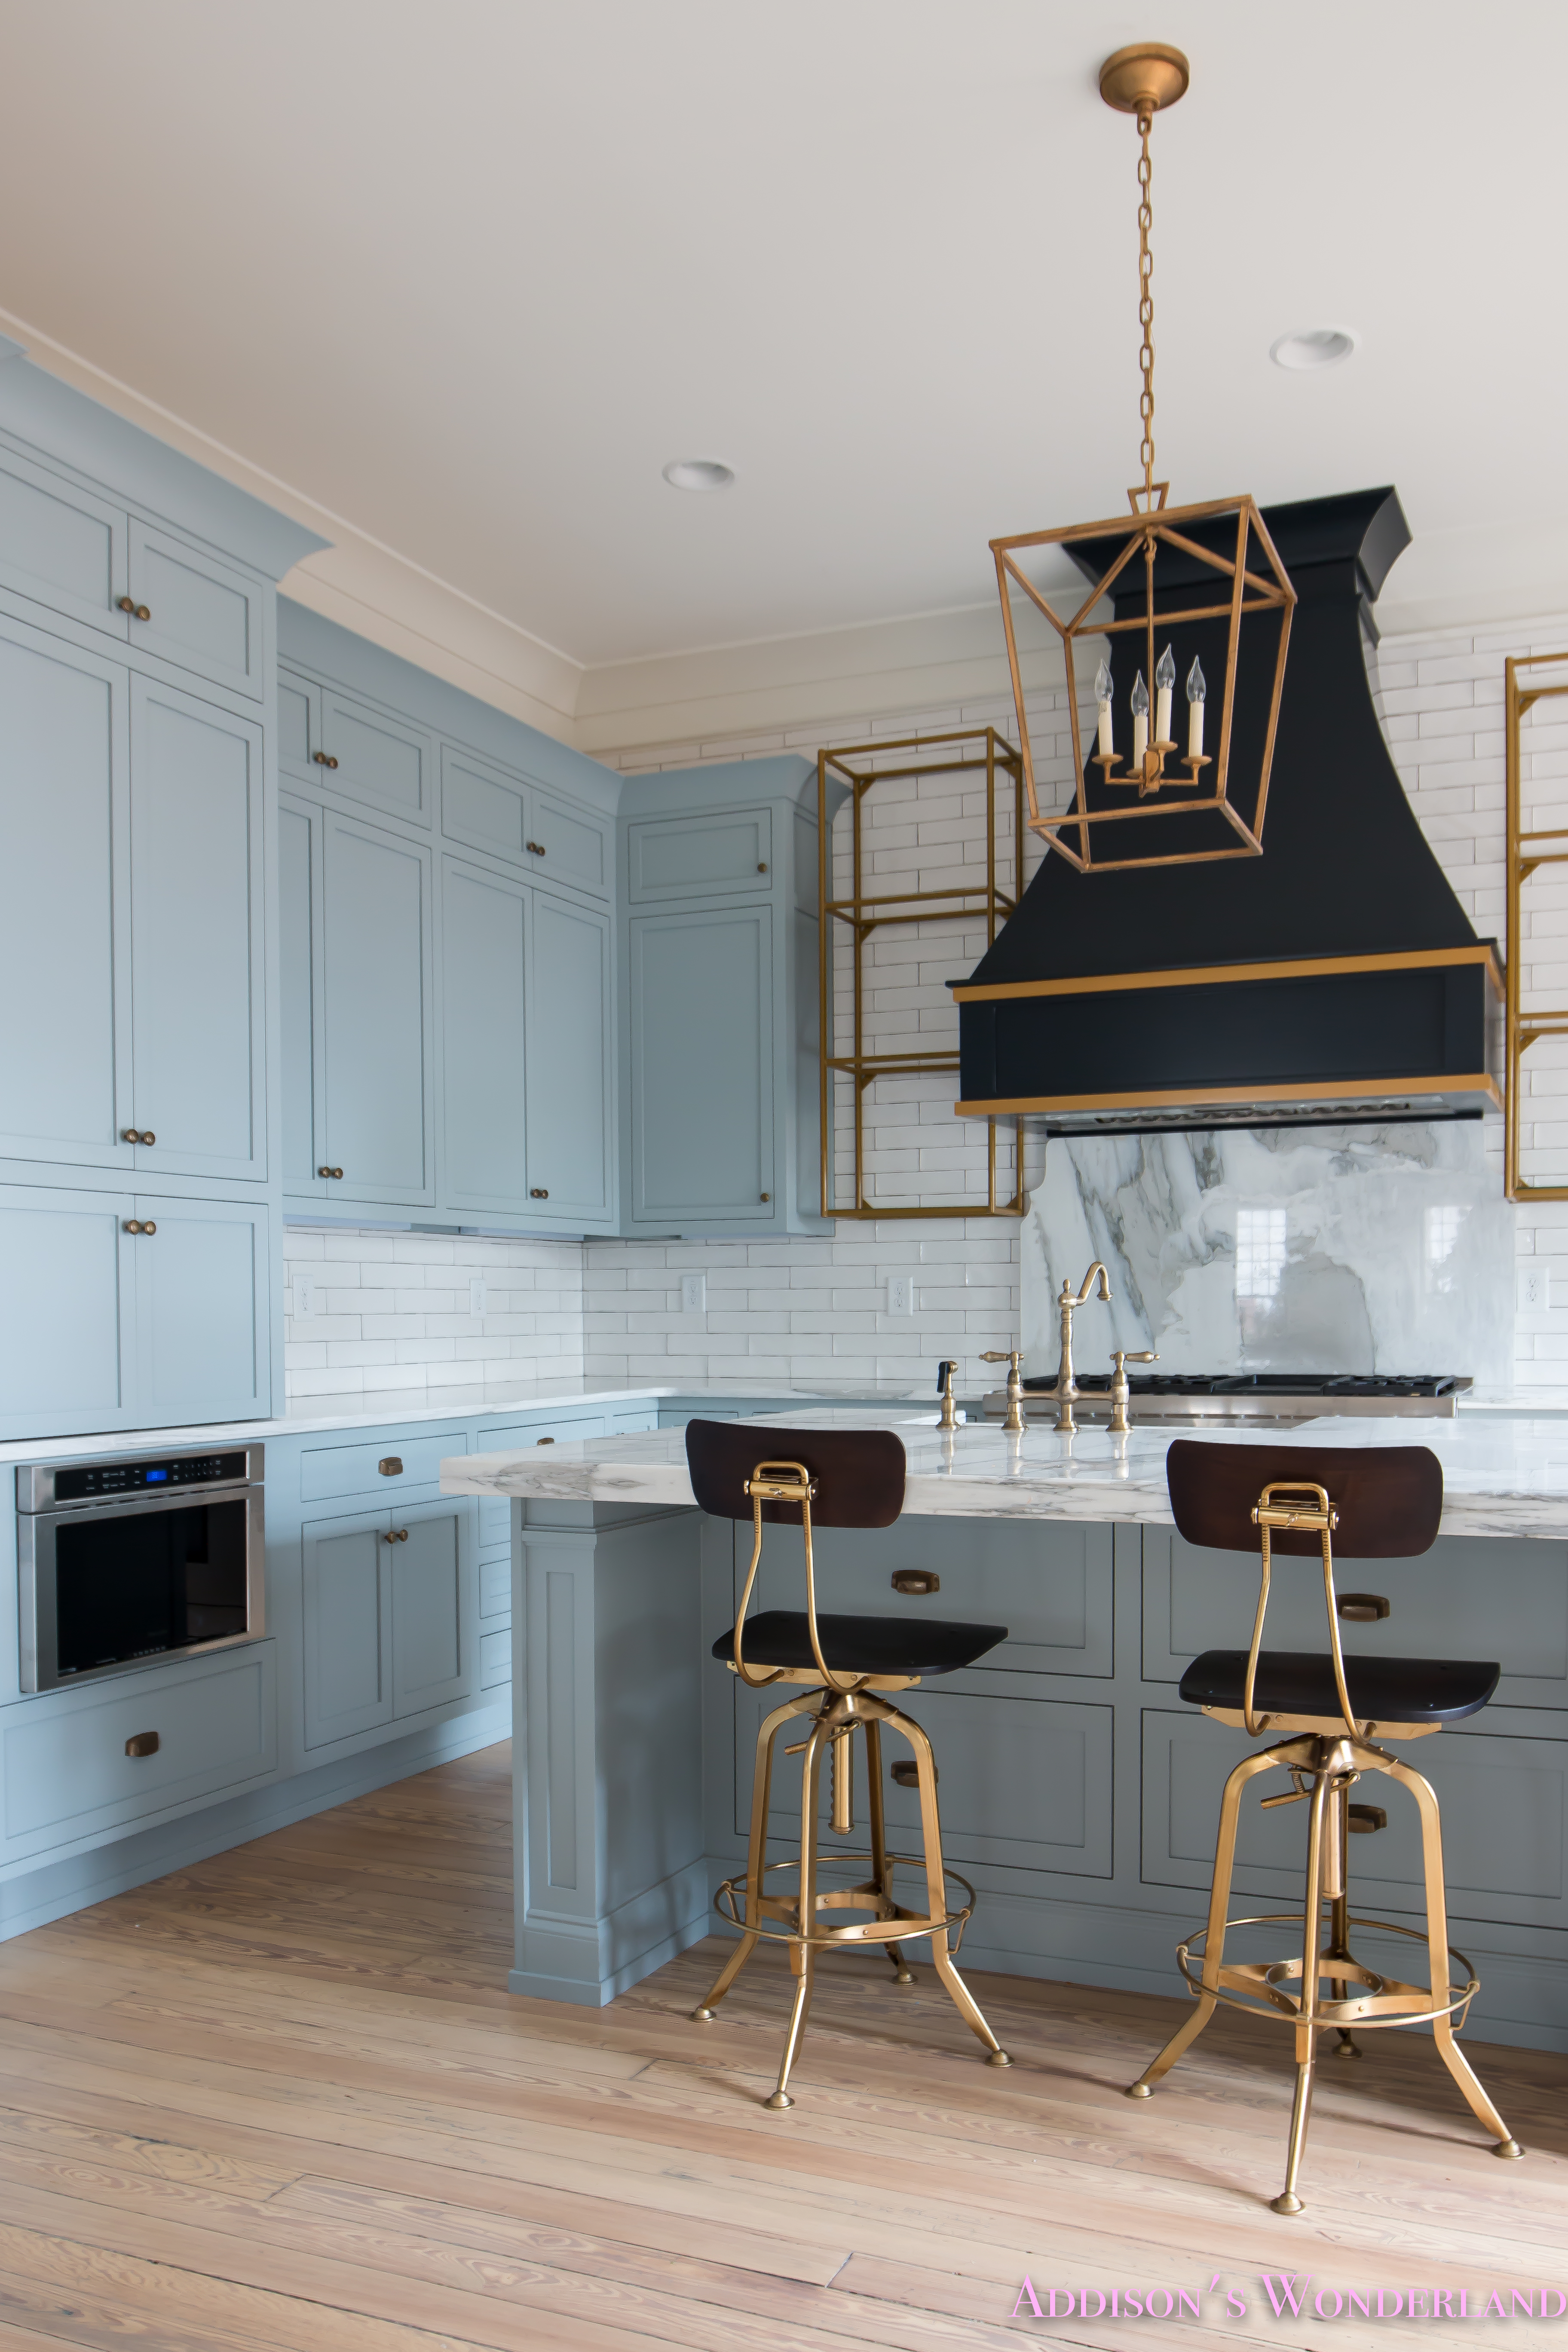 Classic Modern Kitchen Classic Vintage Modern Kitchen Blue Gray Cabinets Inset Shaker